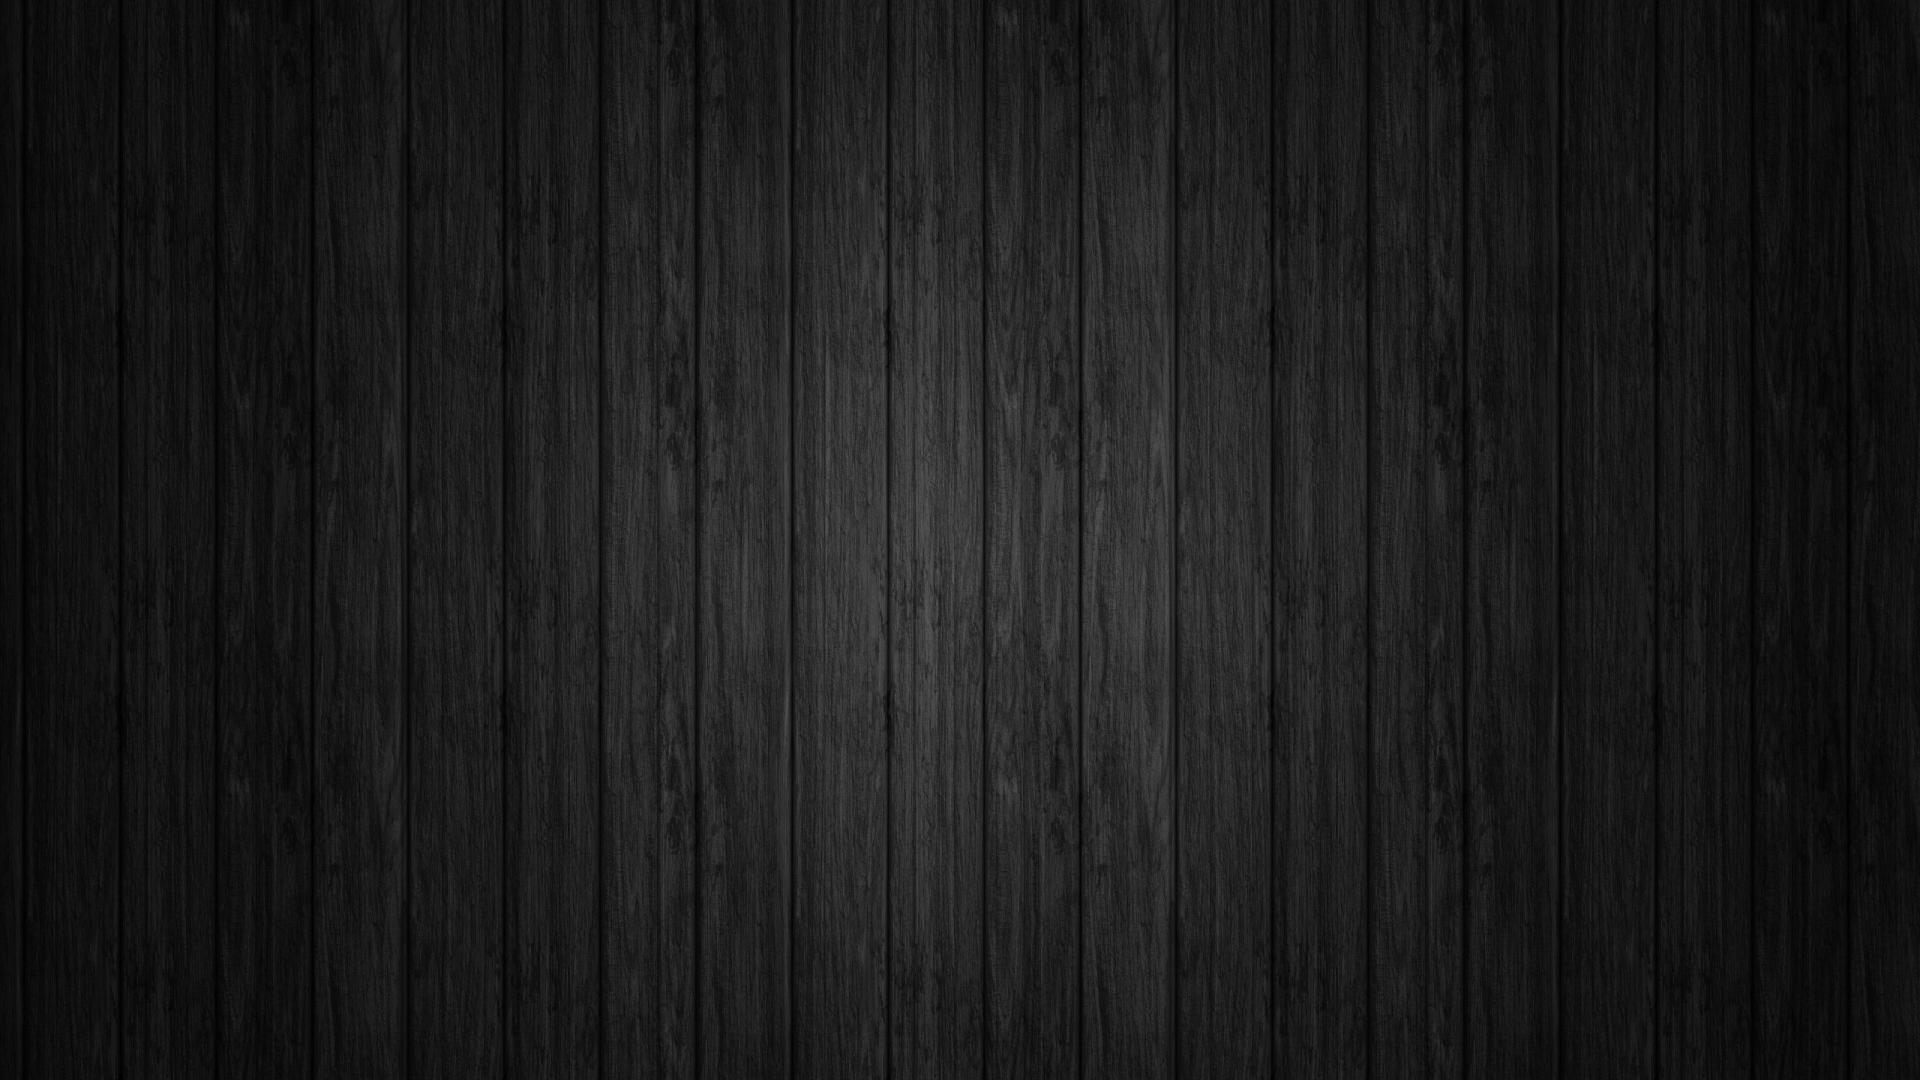 1920x1080 Hd Dark Wallpapers Top Free 1920x1080 Hd Dark Backgrounds Wallpaperaccess